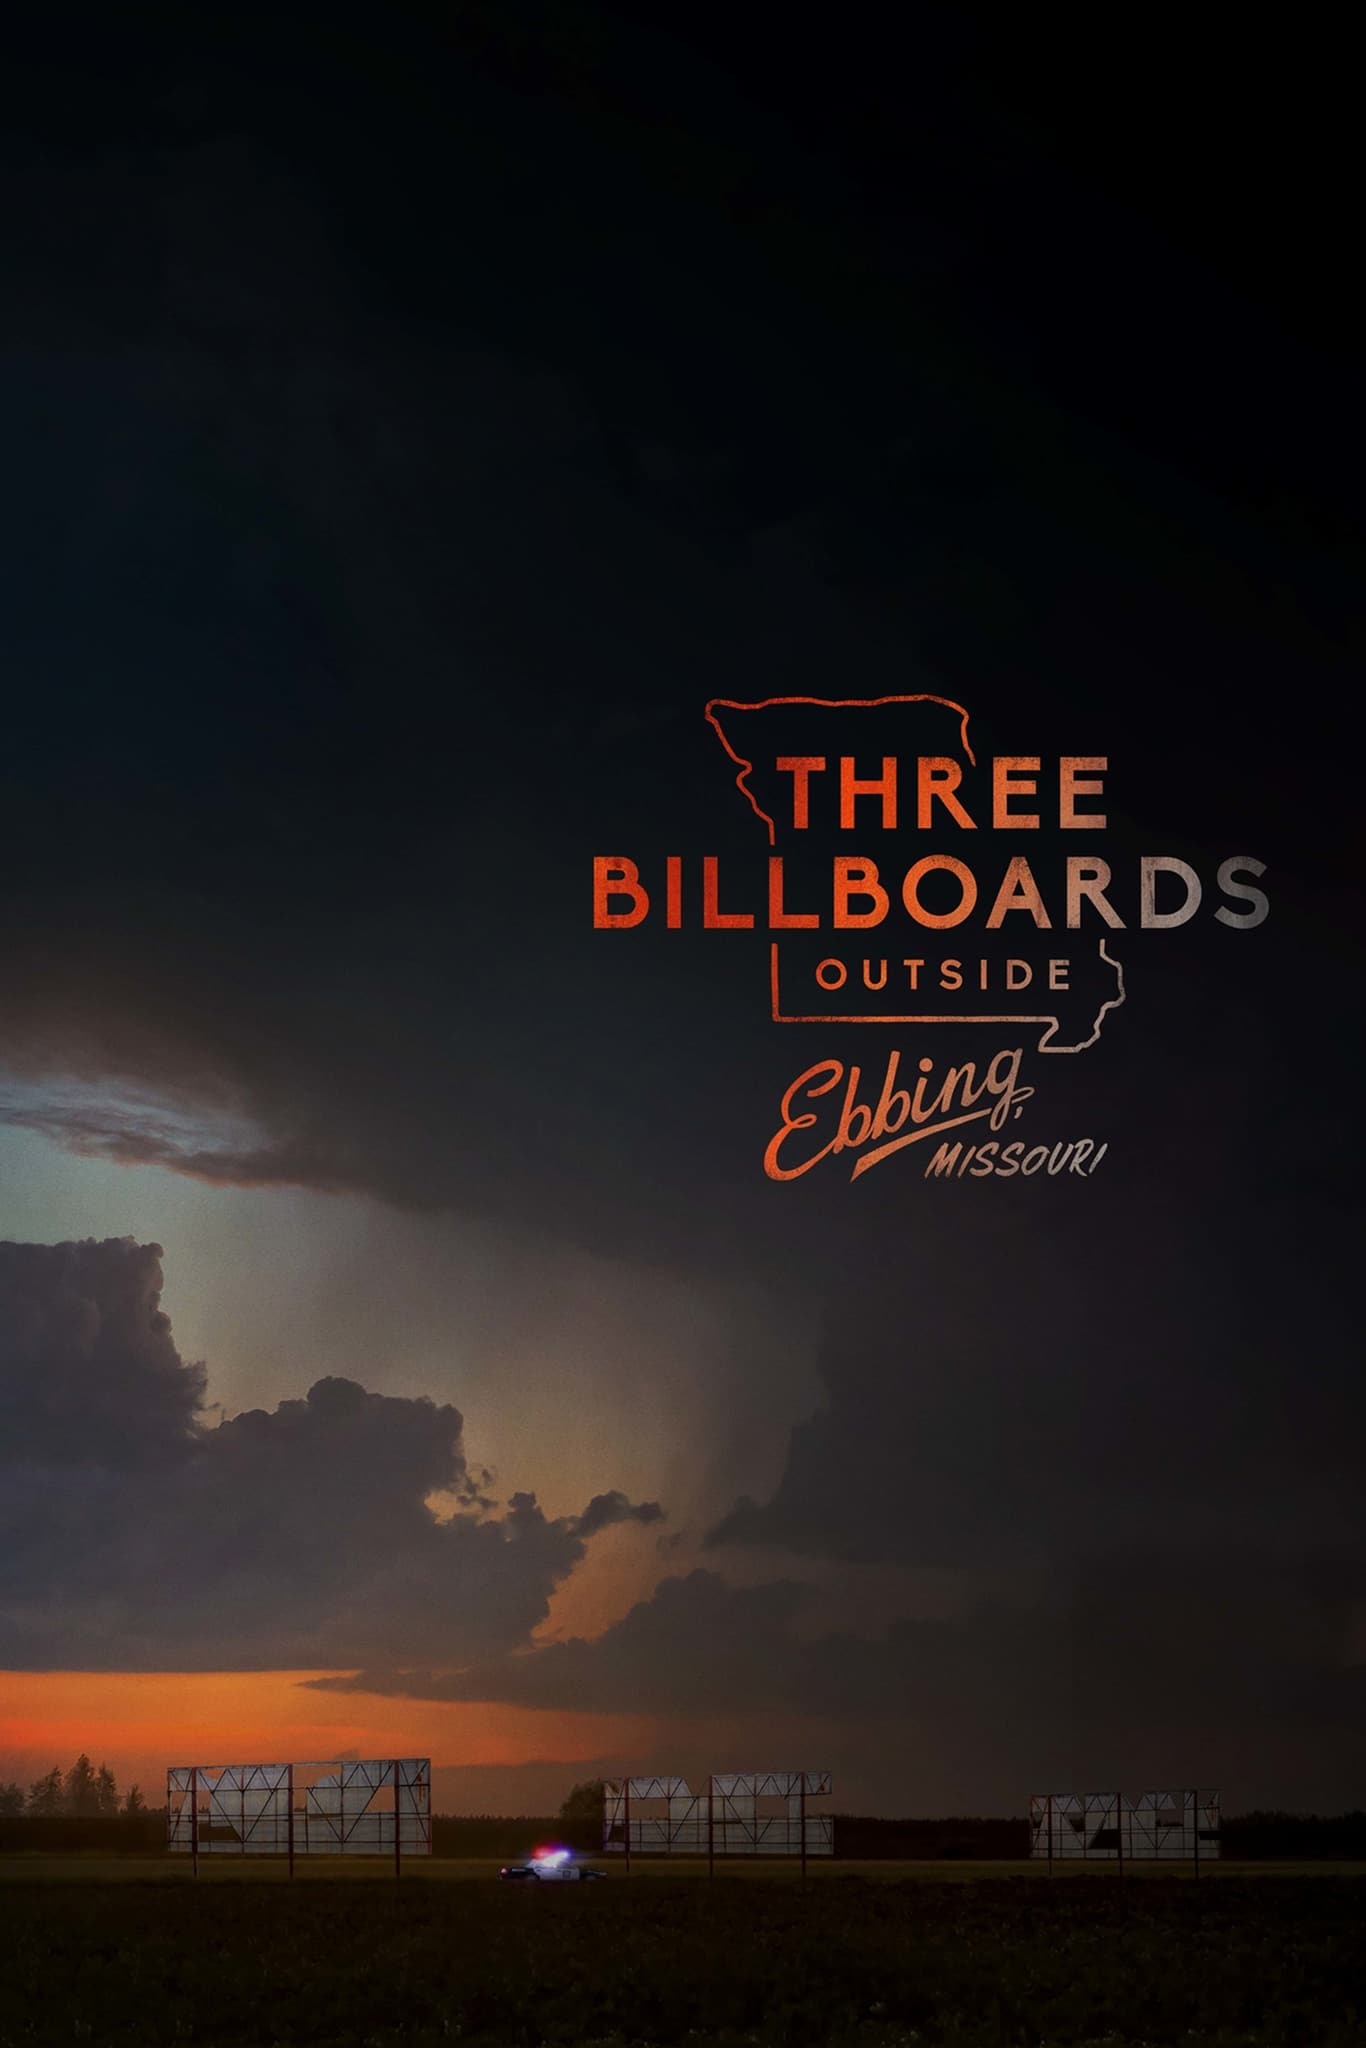 Three Billboards Outside Ebbing, Missouri Movie Streaming Online Watch on Disney Plus Hotstar, Google Play, Youtube, iTunes